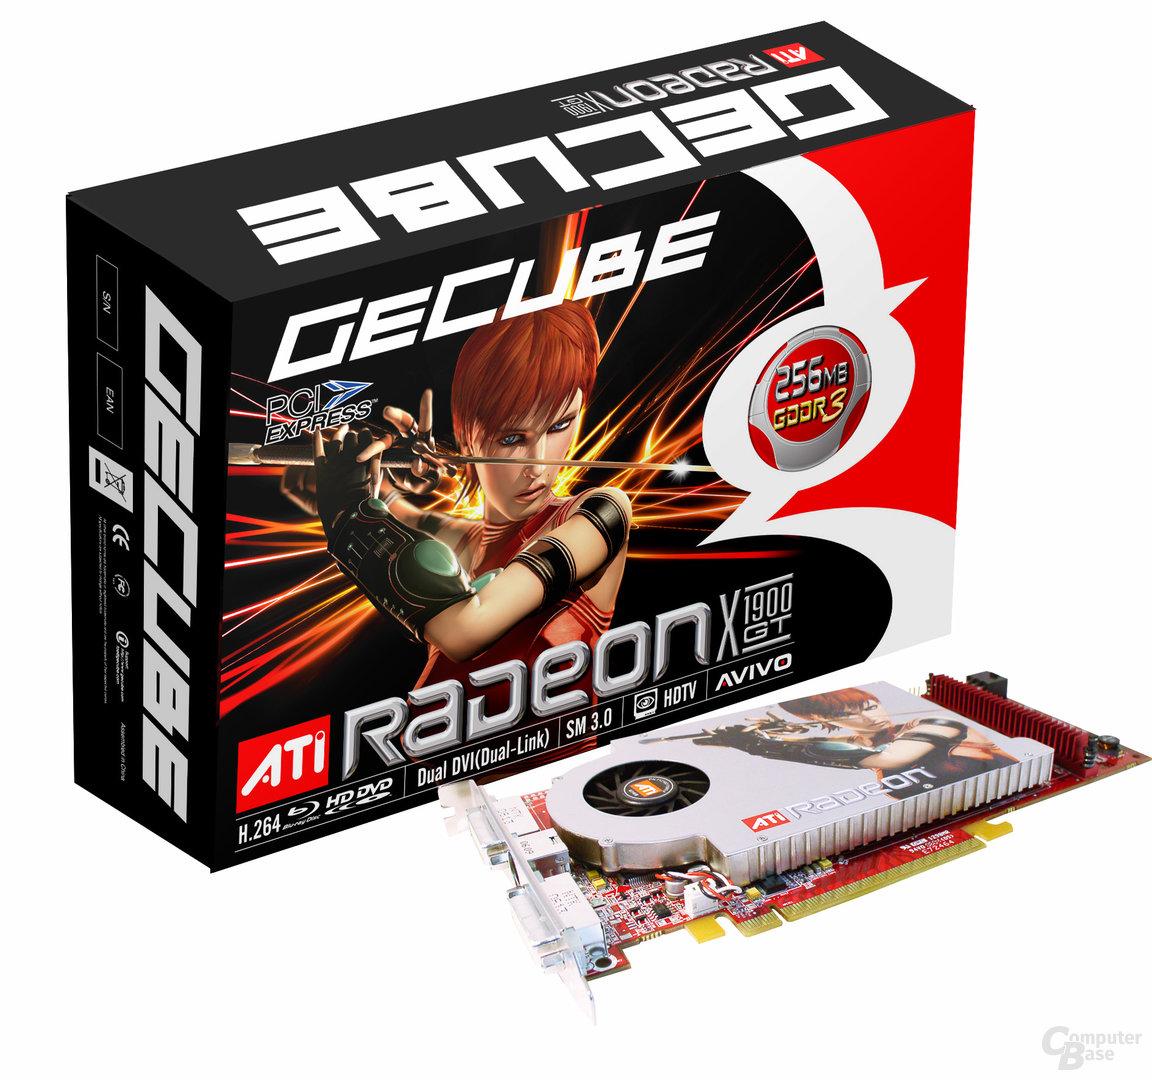 GeCube Radeon X1900 GT